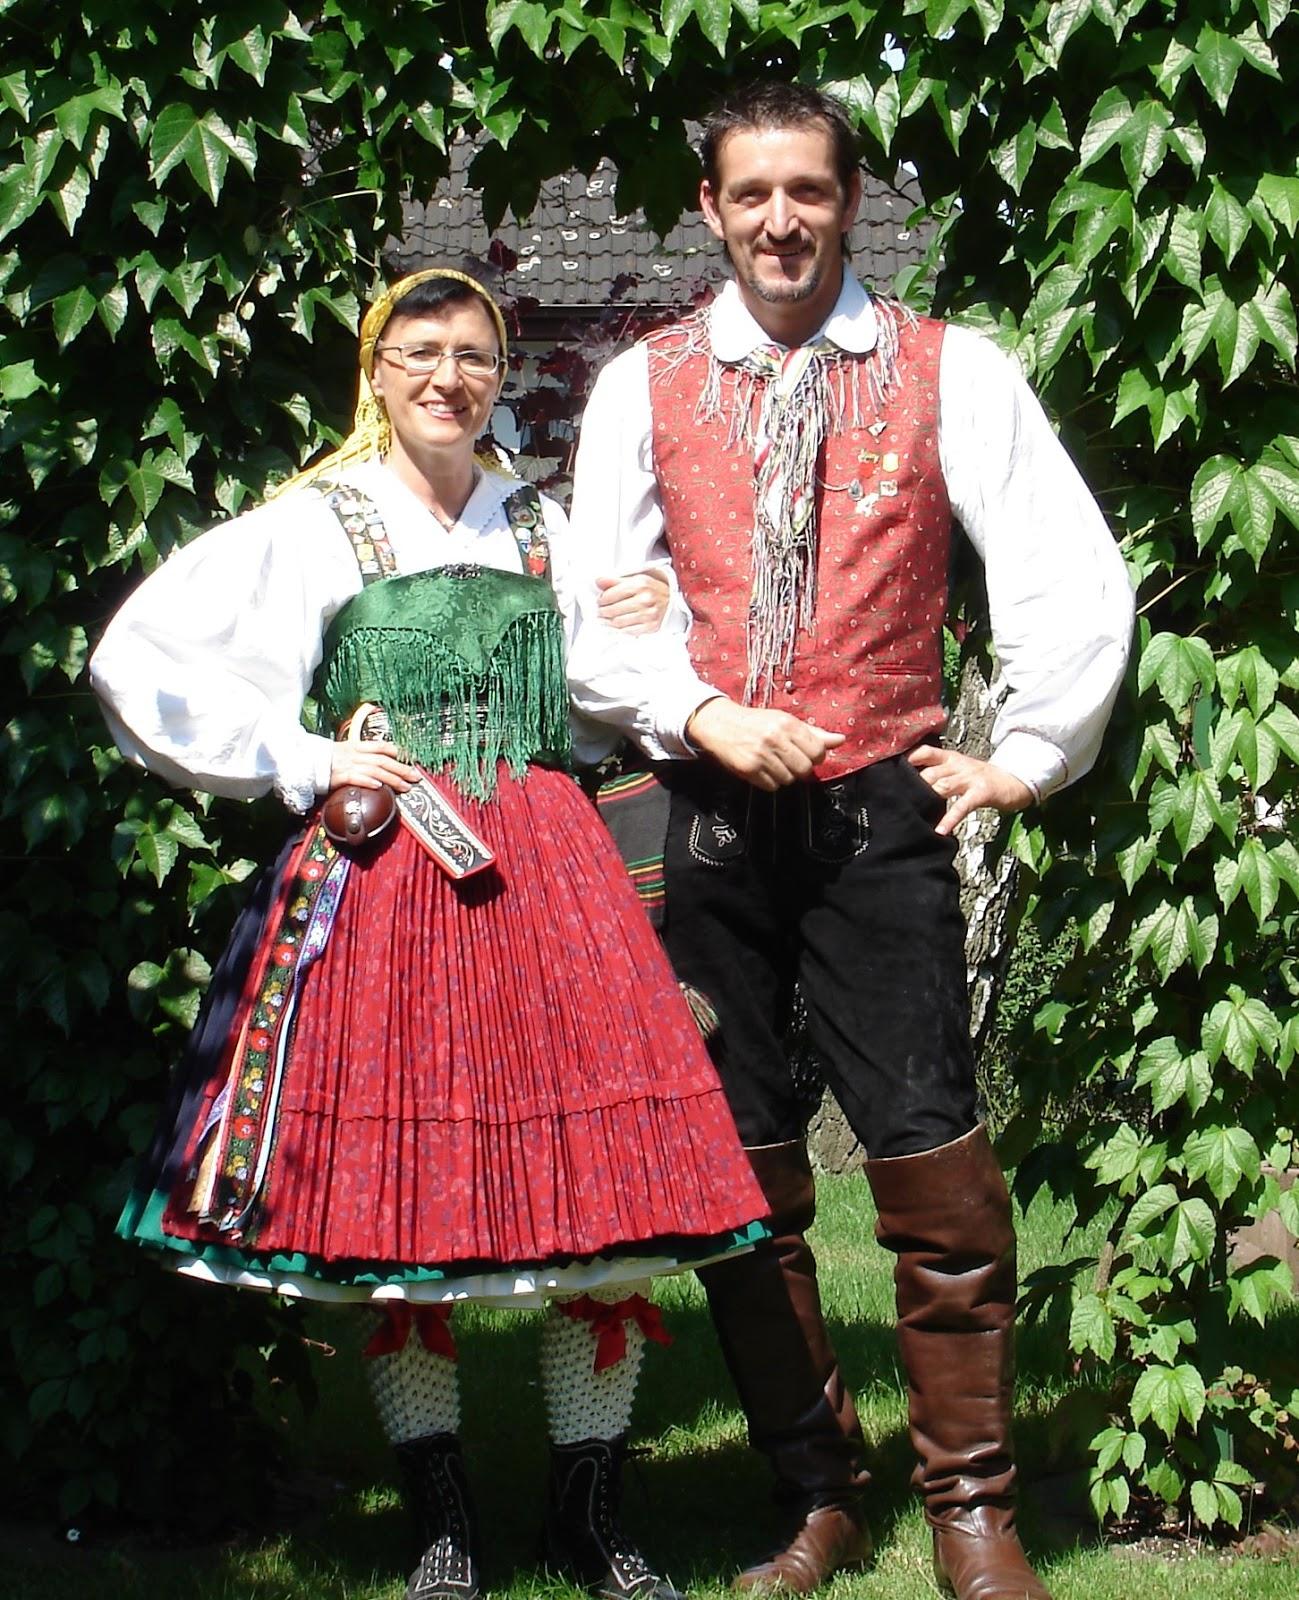 Traditional: FolkCostume&Embroidery: Slovenian / Austrian Costume Of